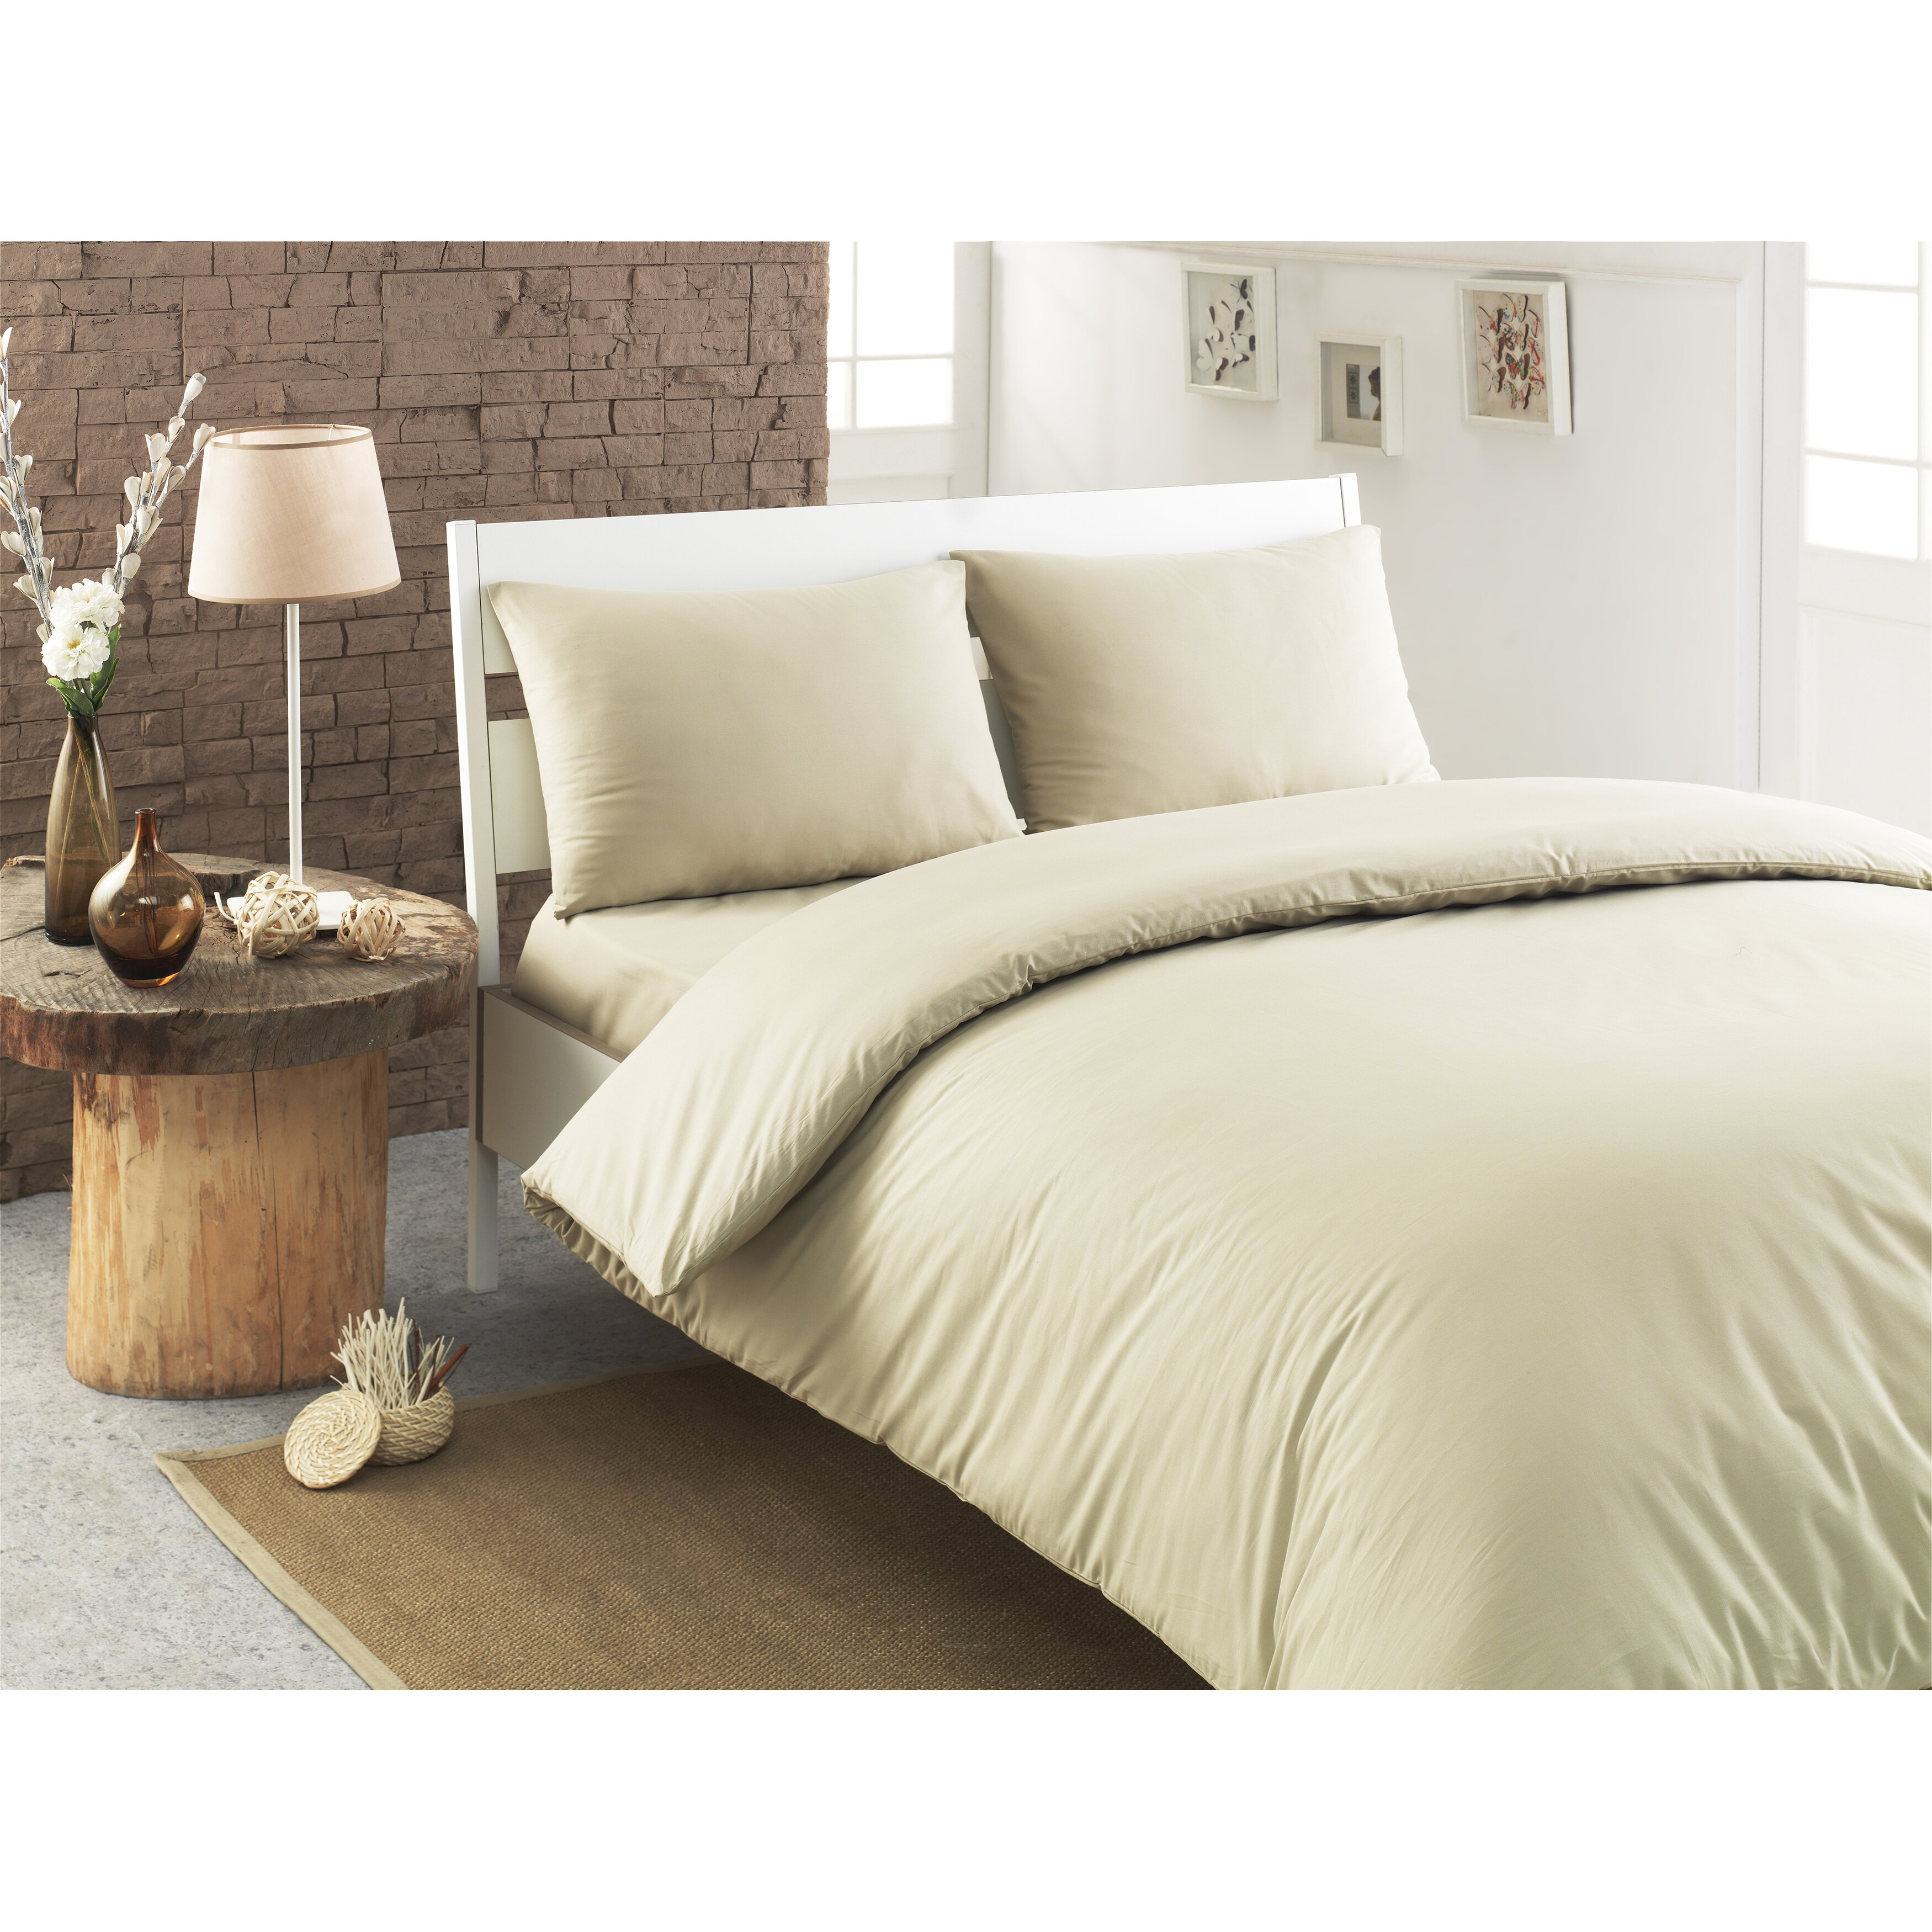 pera 100 turkish cotton luxury duvet cover wayfair. Black Bedroom Furniture Sets. Home Design Ideas